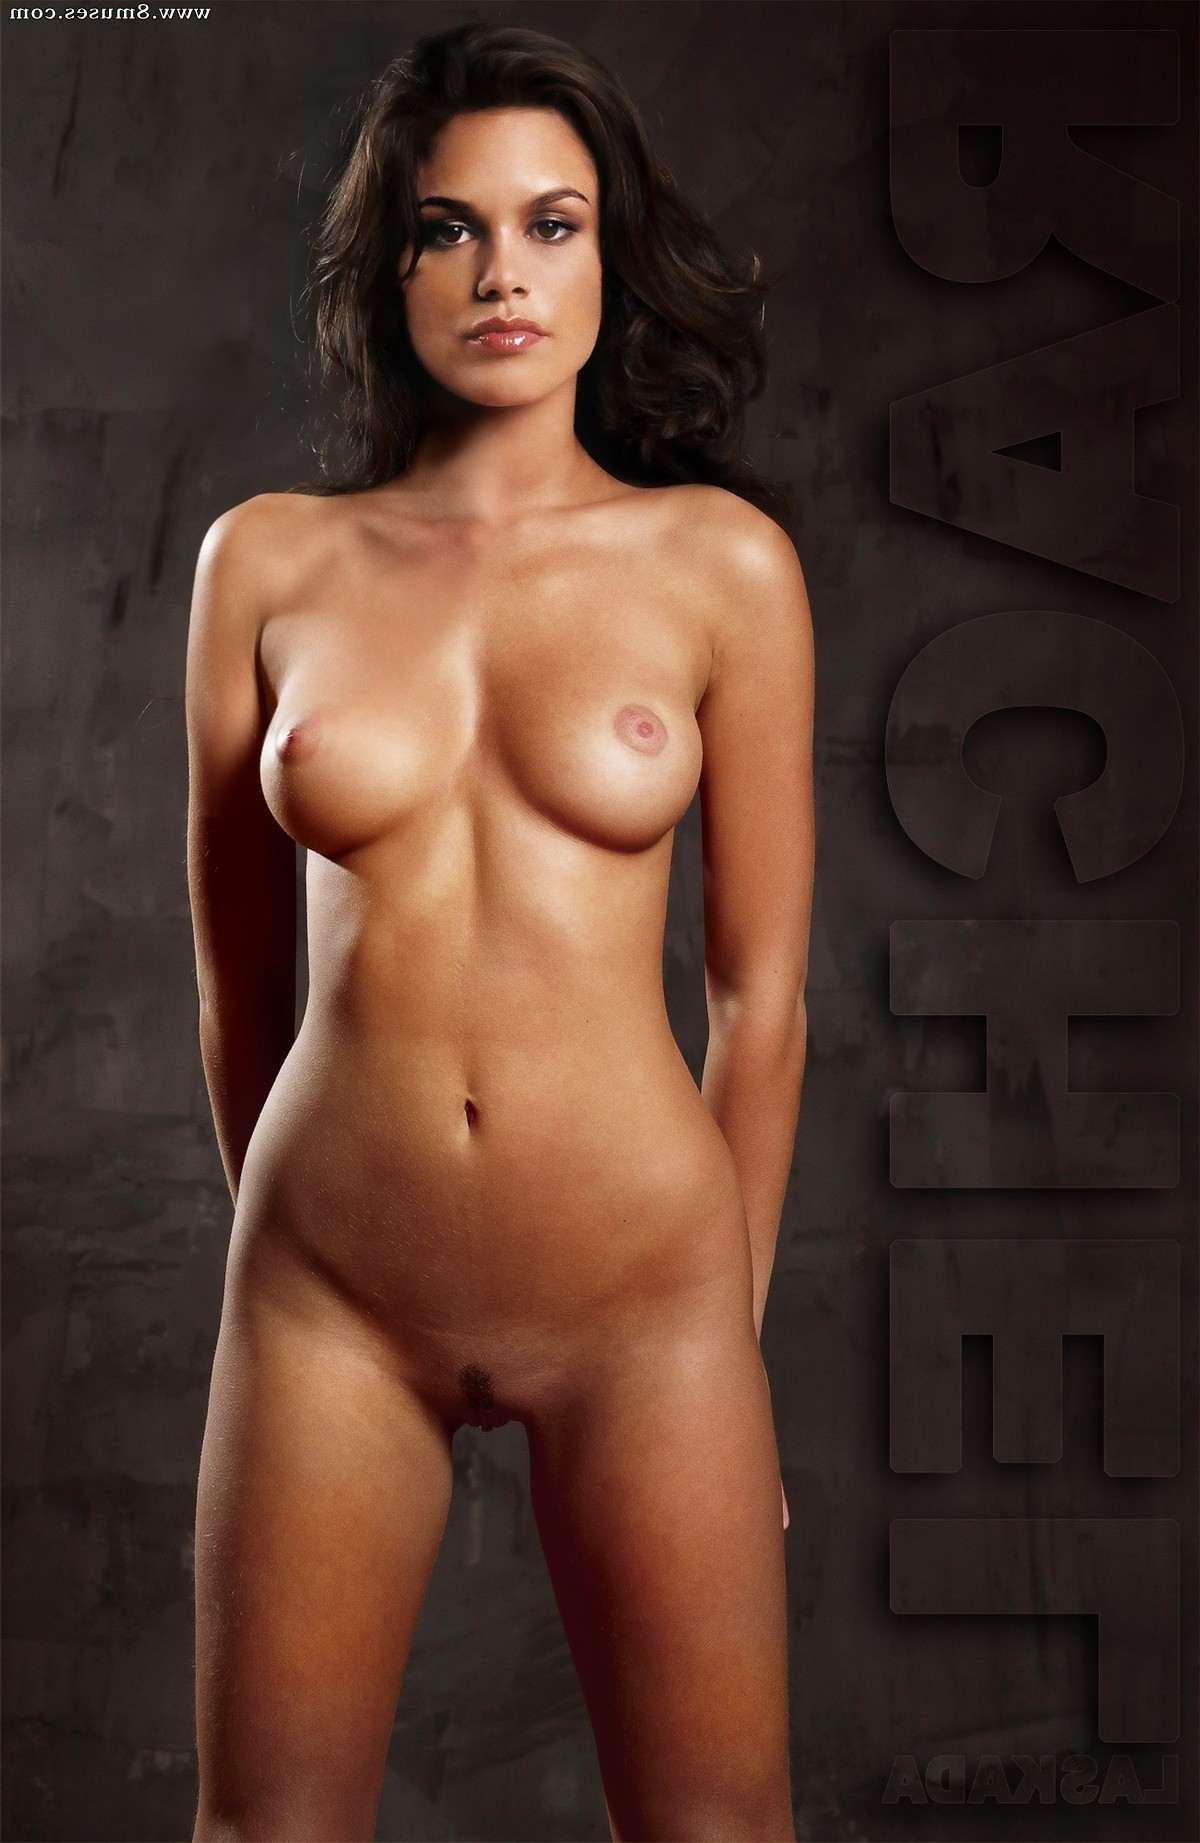 Fake-Celebrities-Sex-Pictures/Rachel-Bilson Rachel_Bilson__8muses_-_Sex_and_Porn_Comics_12.jpg